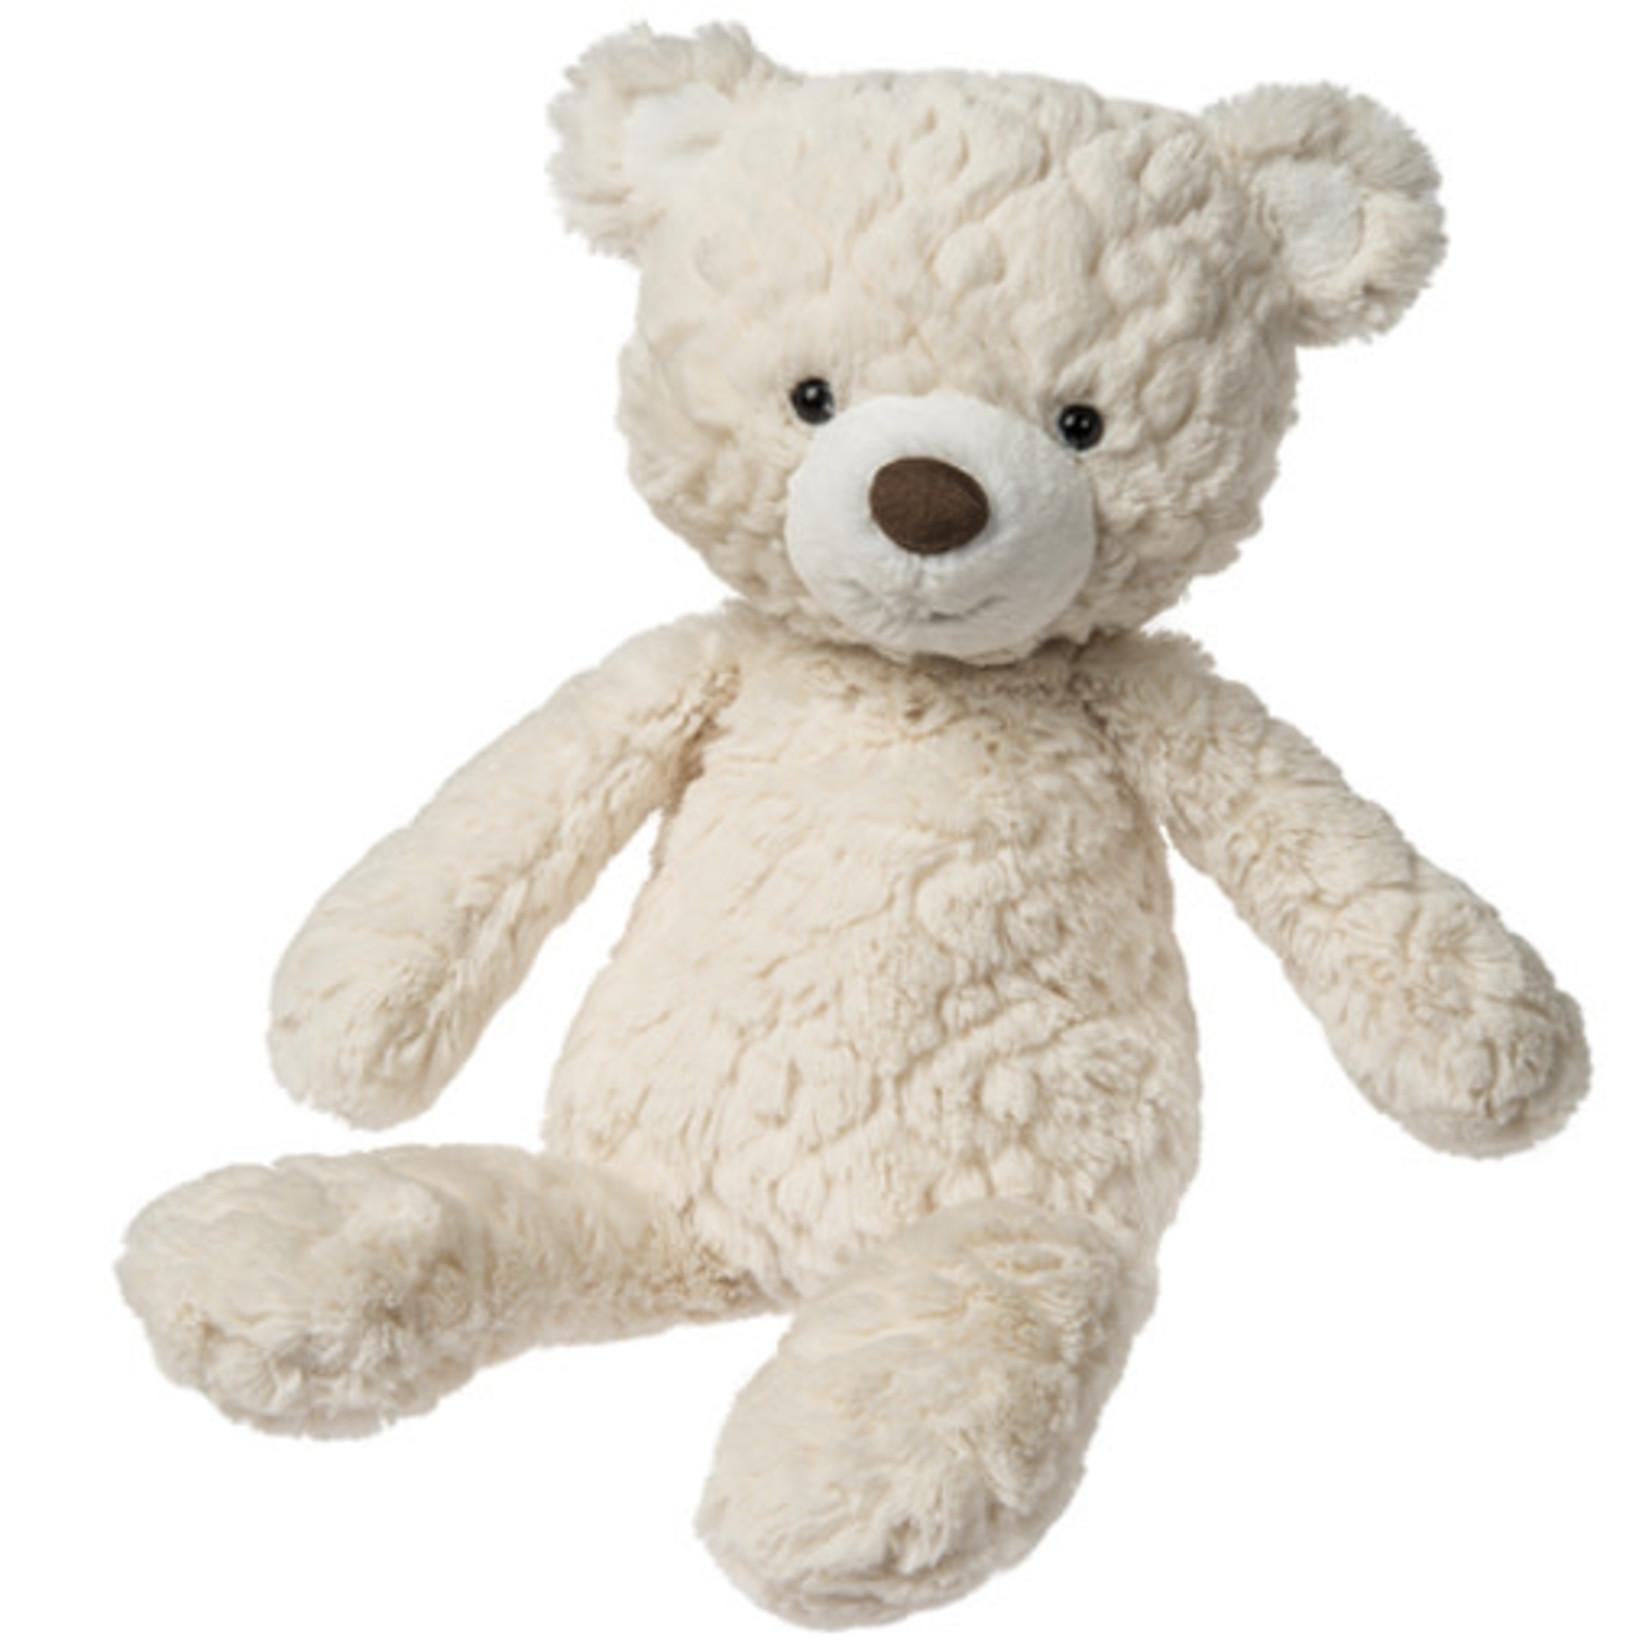 Mary Meyer Plush: Medium Cream Putty Bear